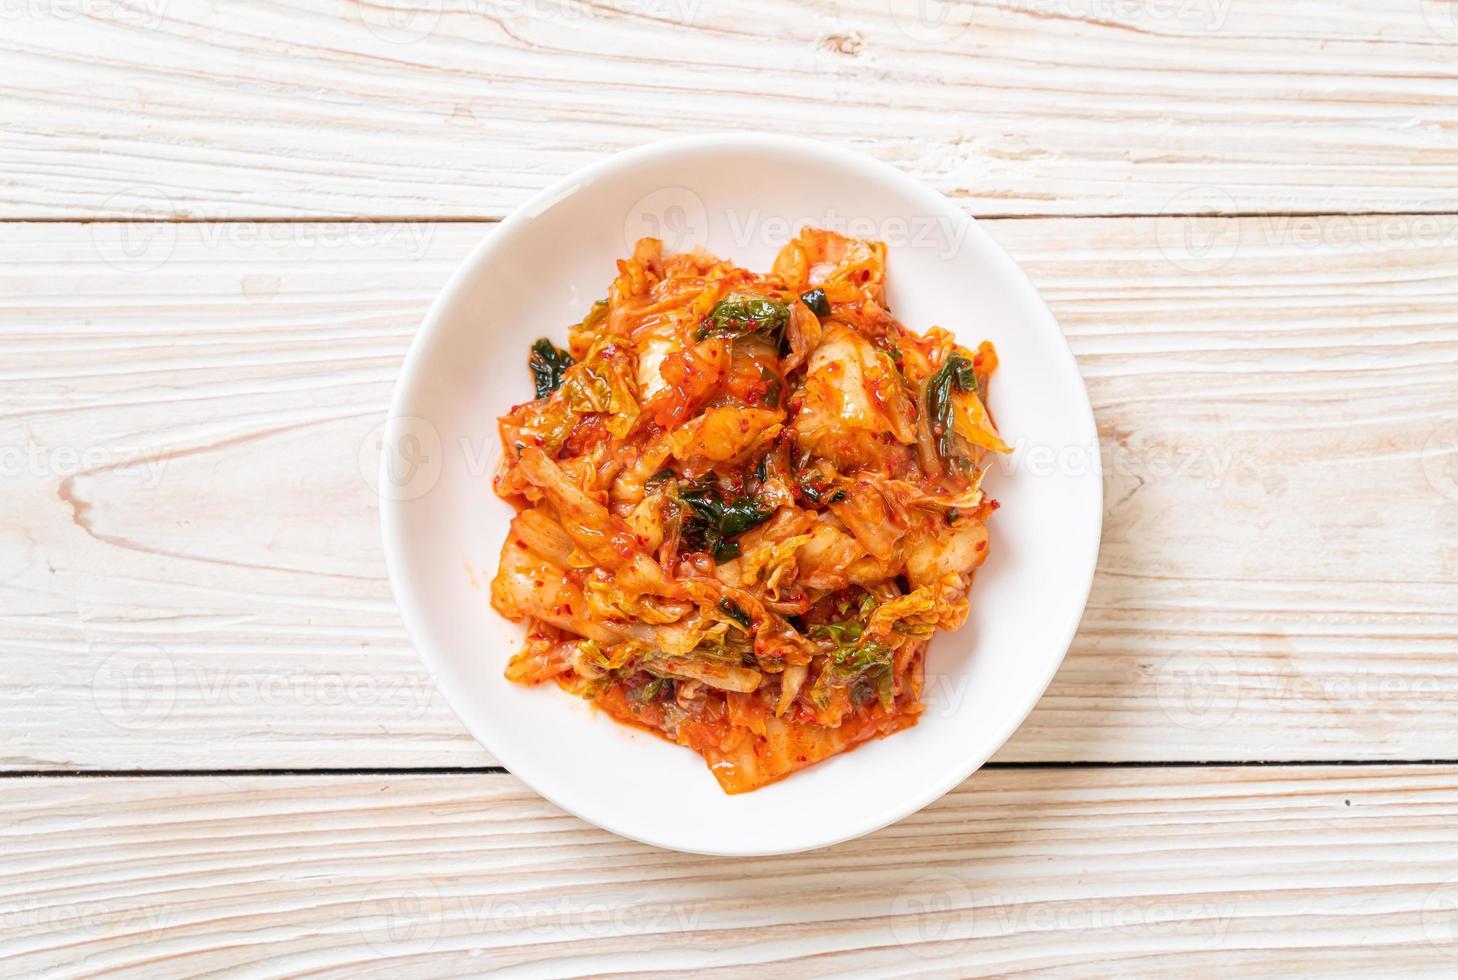 Kimchi cabbage on plate photo